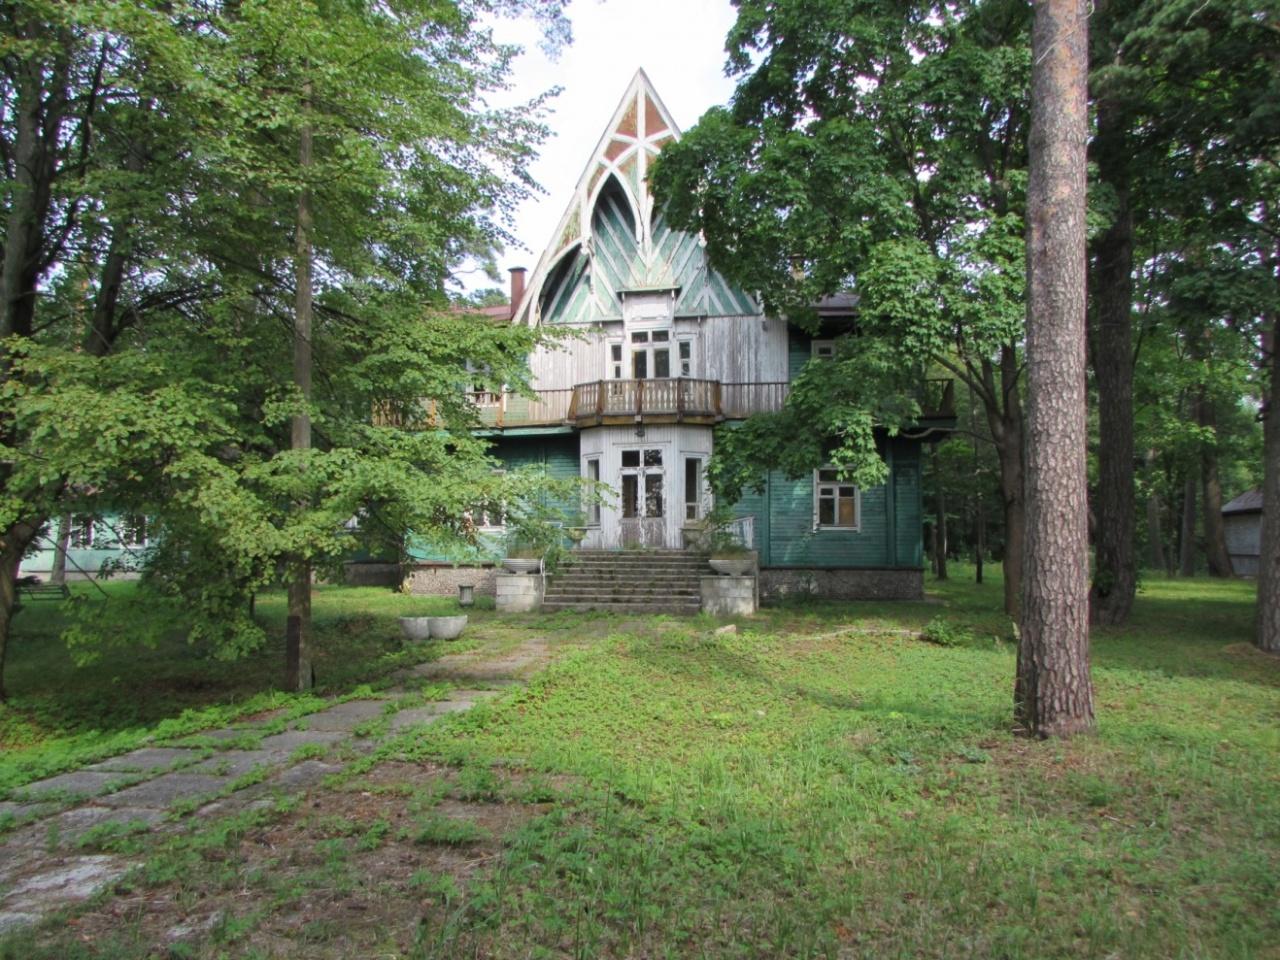 Дачу Кинга и дом купца Елисеева в Зеленогорске превратят в туристический комплекс